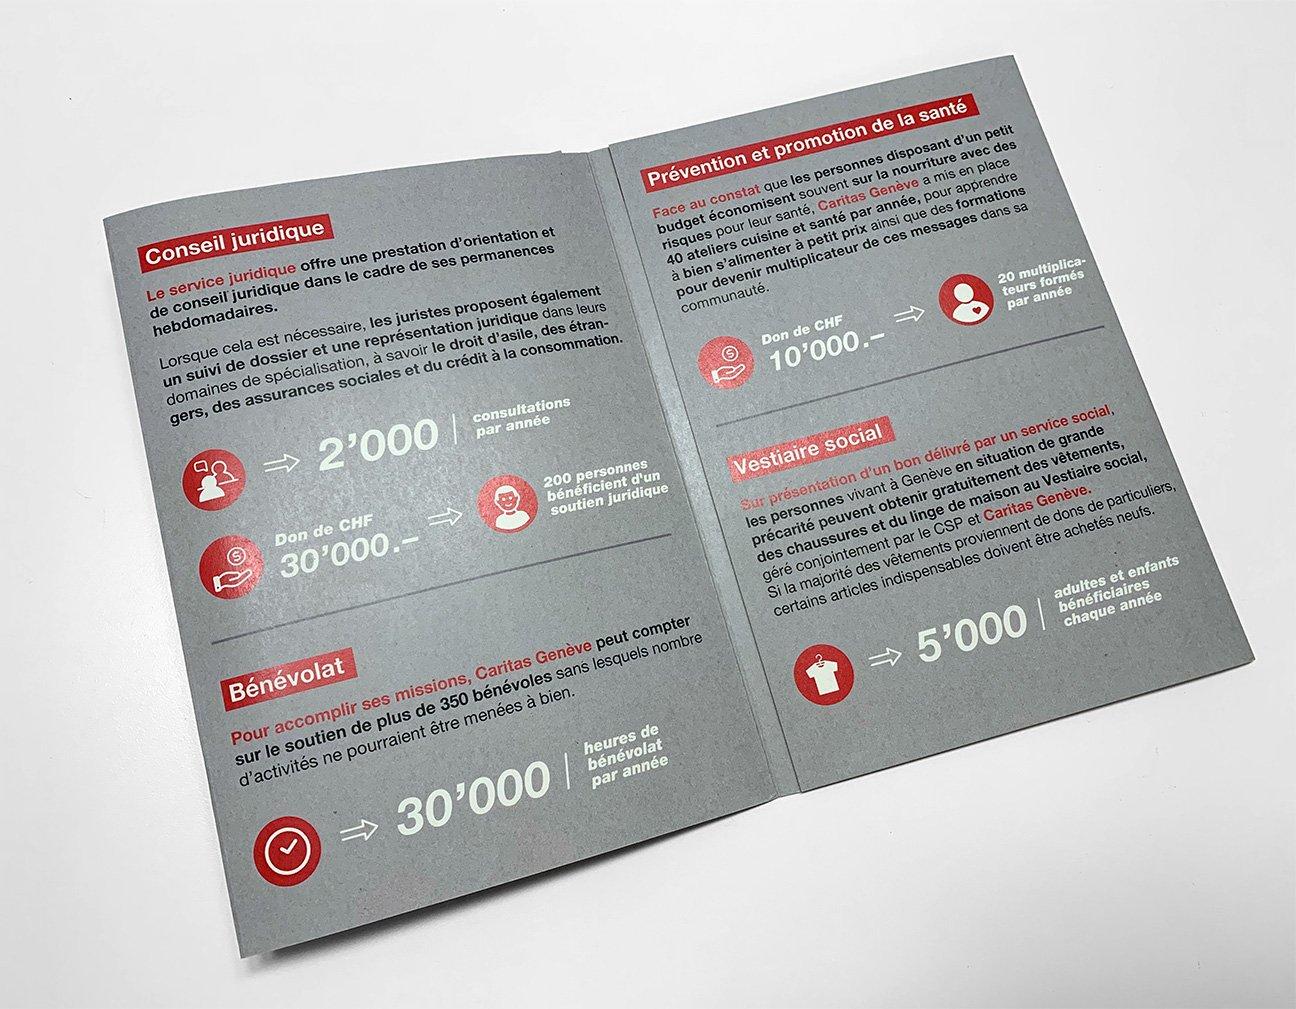 fabien_cuffel_graphisme_typographie_Brochure_Caritas_interieur_Geneve_ok